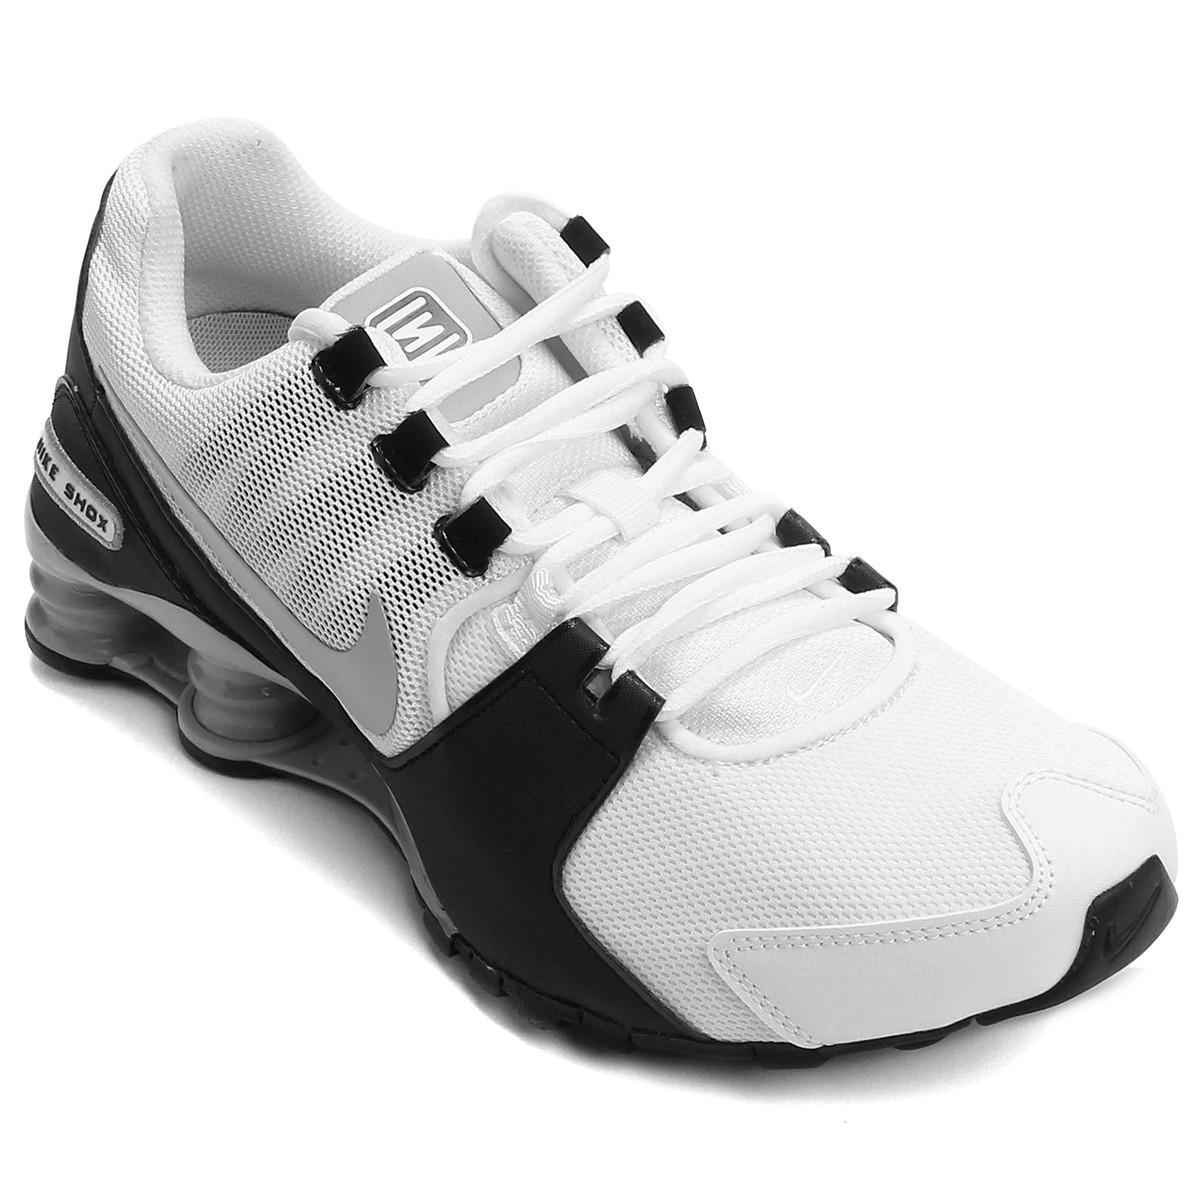 1c734385a7b Tênis Nike Shox Avenue 833583-100 - Branco Preto Cinza - Calçados ...